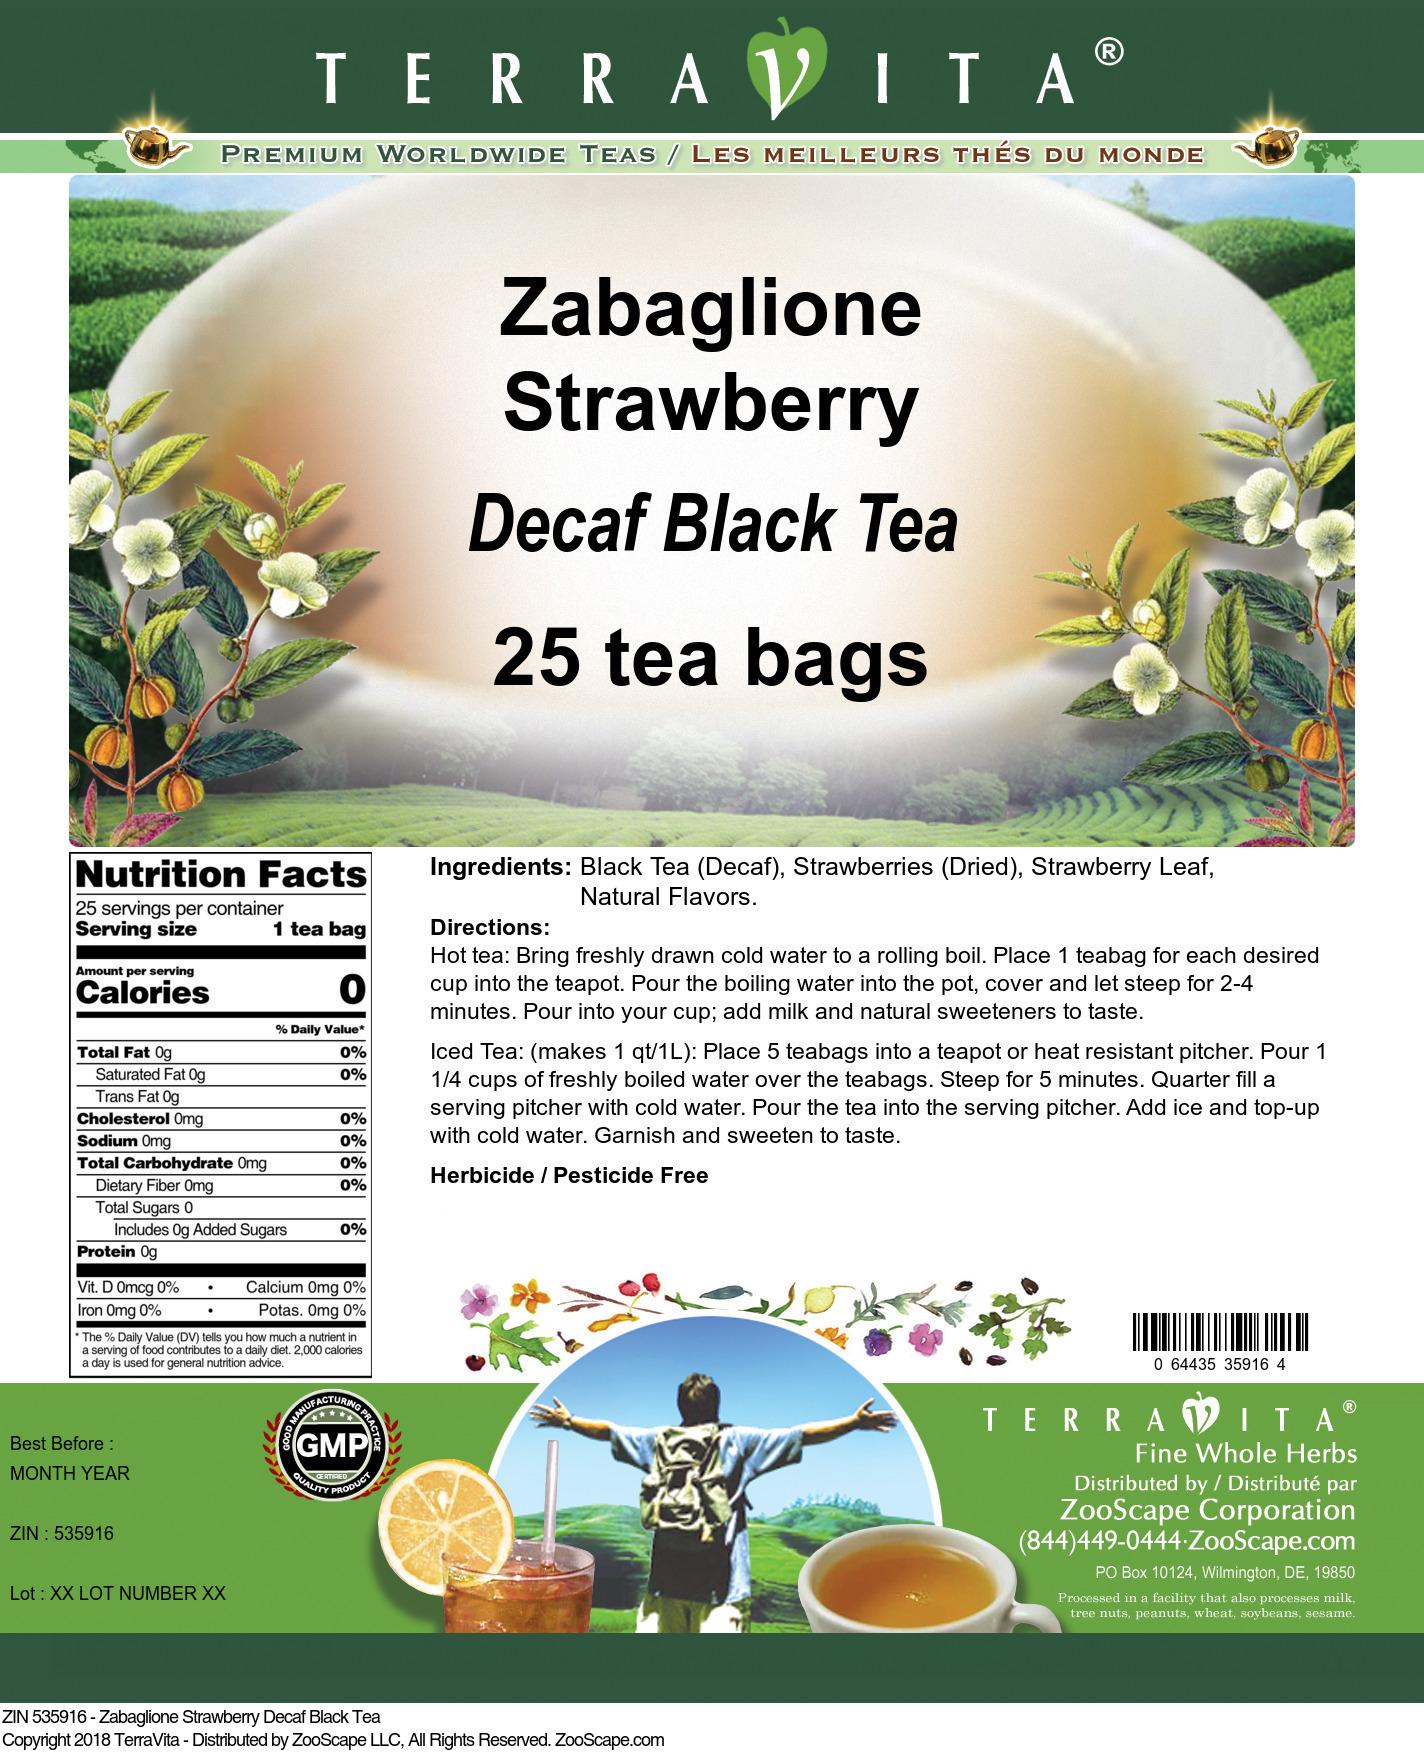 Zabaglione Strawberry Decaf Black Tea